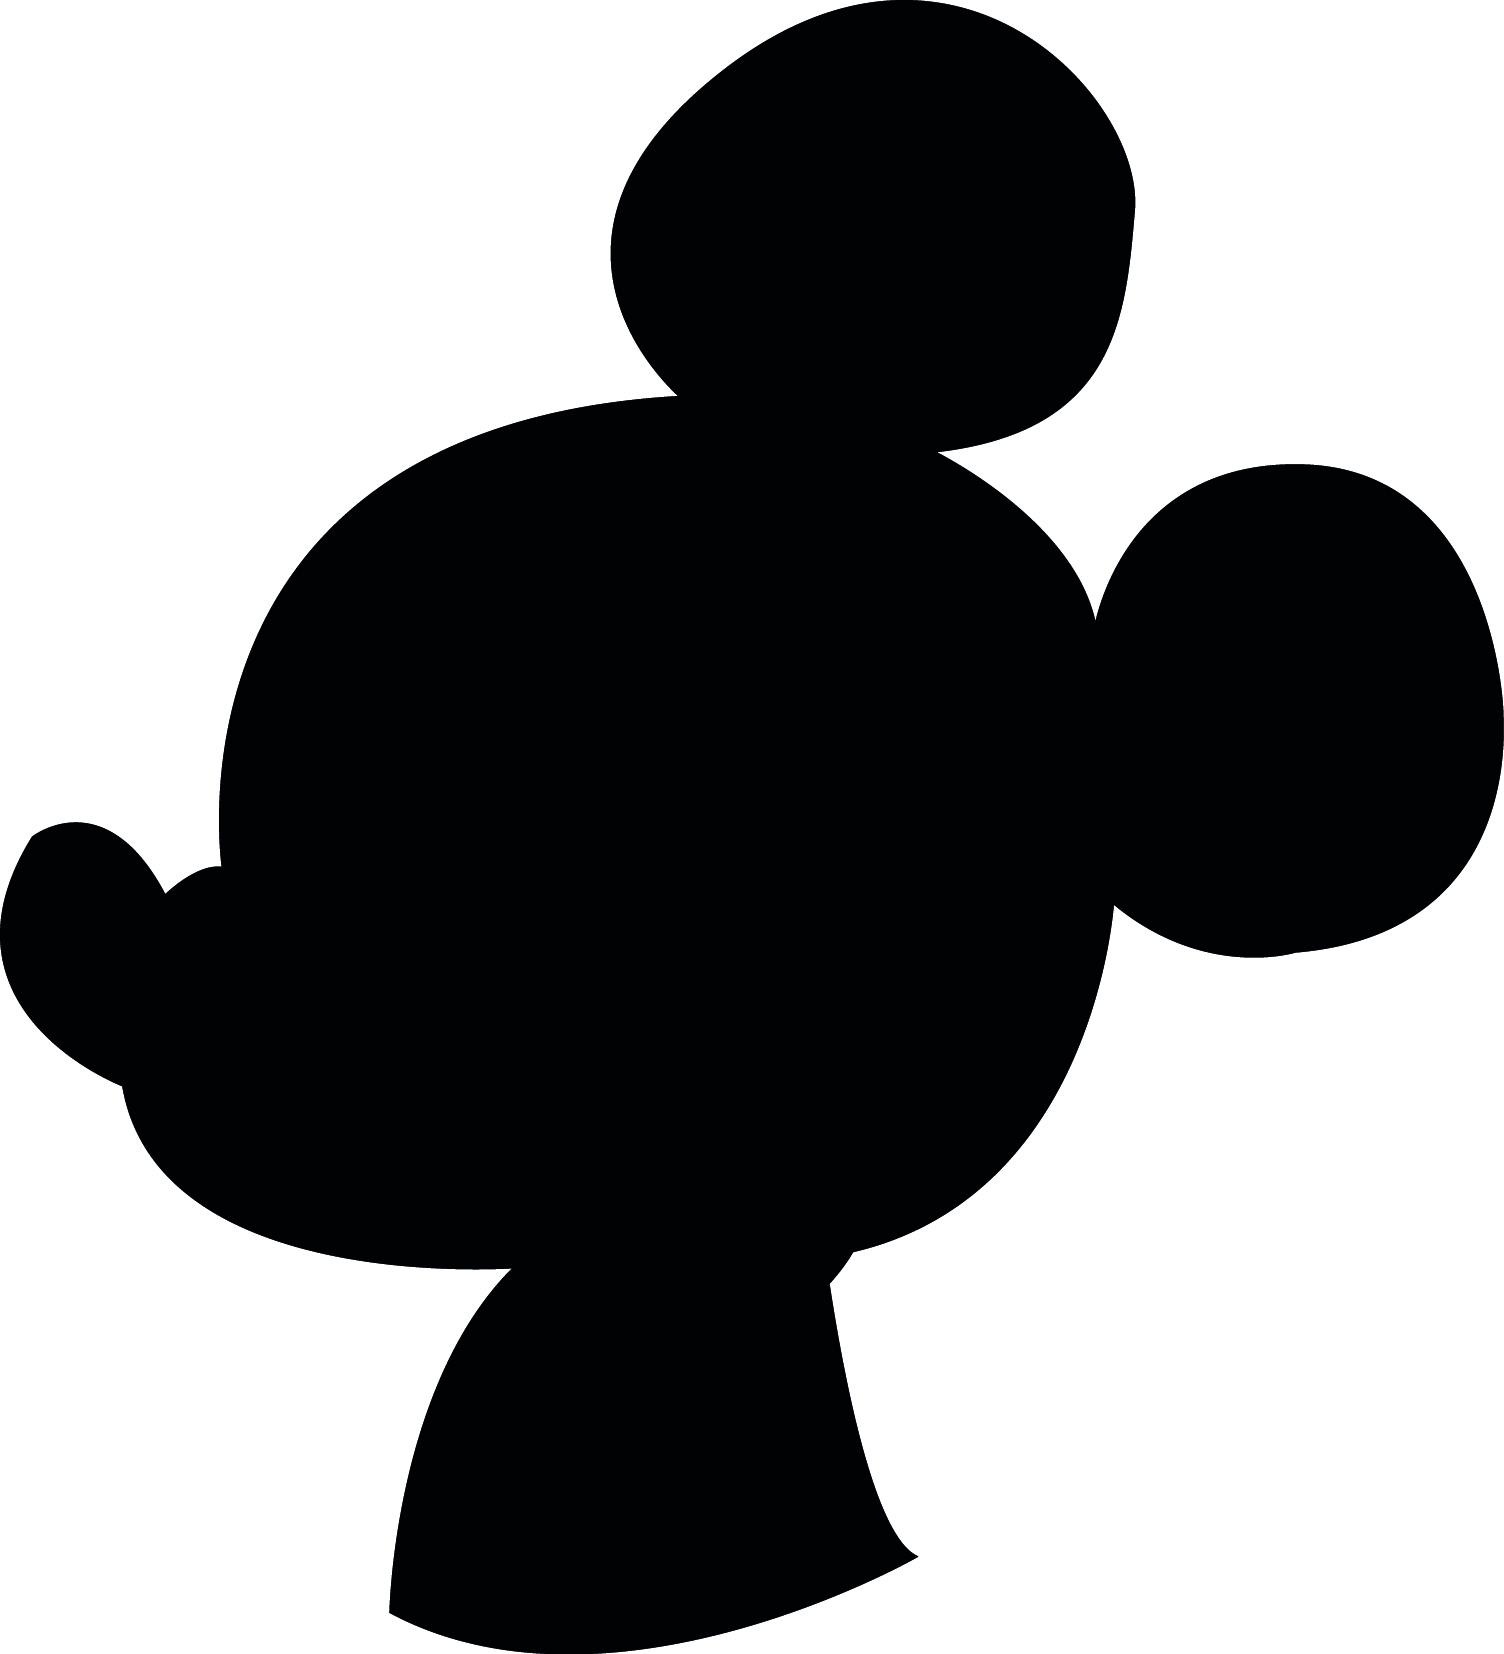 downloadable_printable_mickey_profile_silhouette